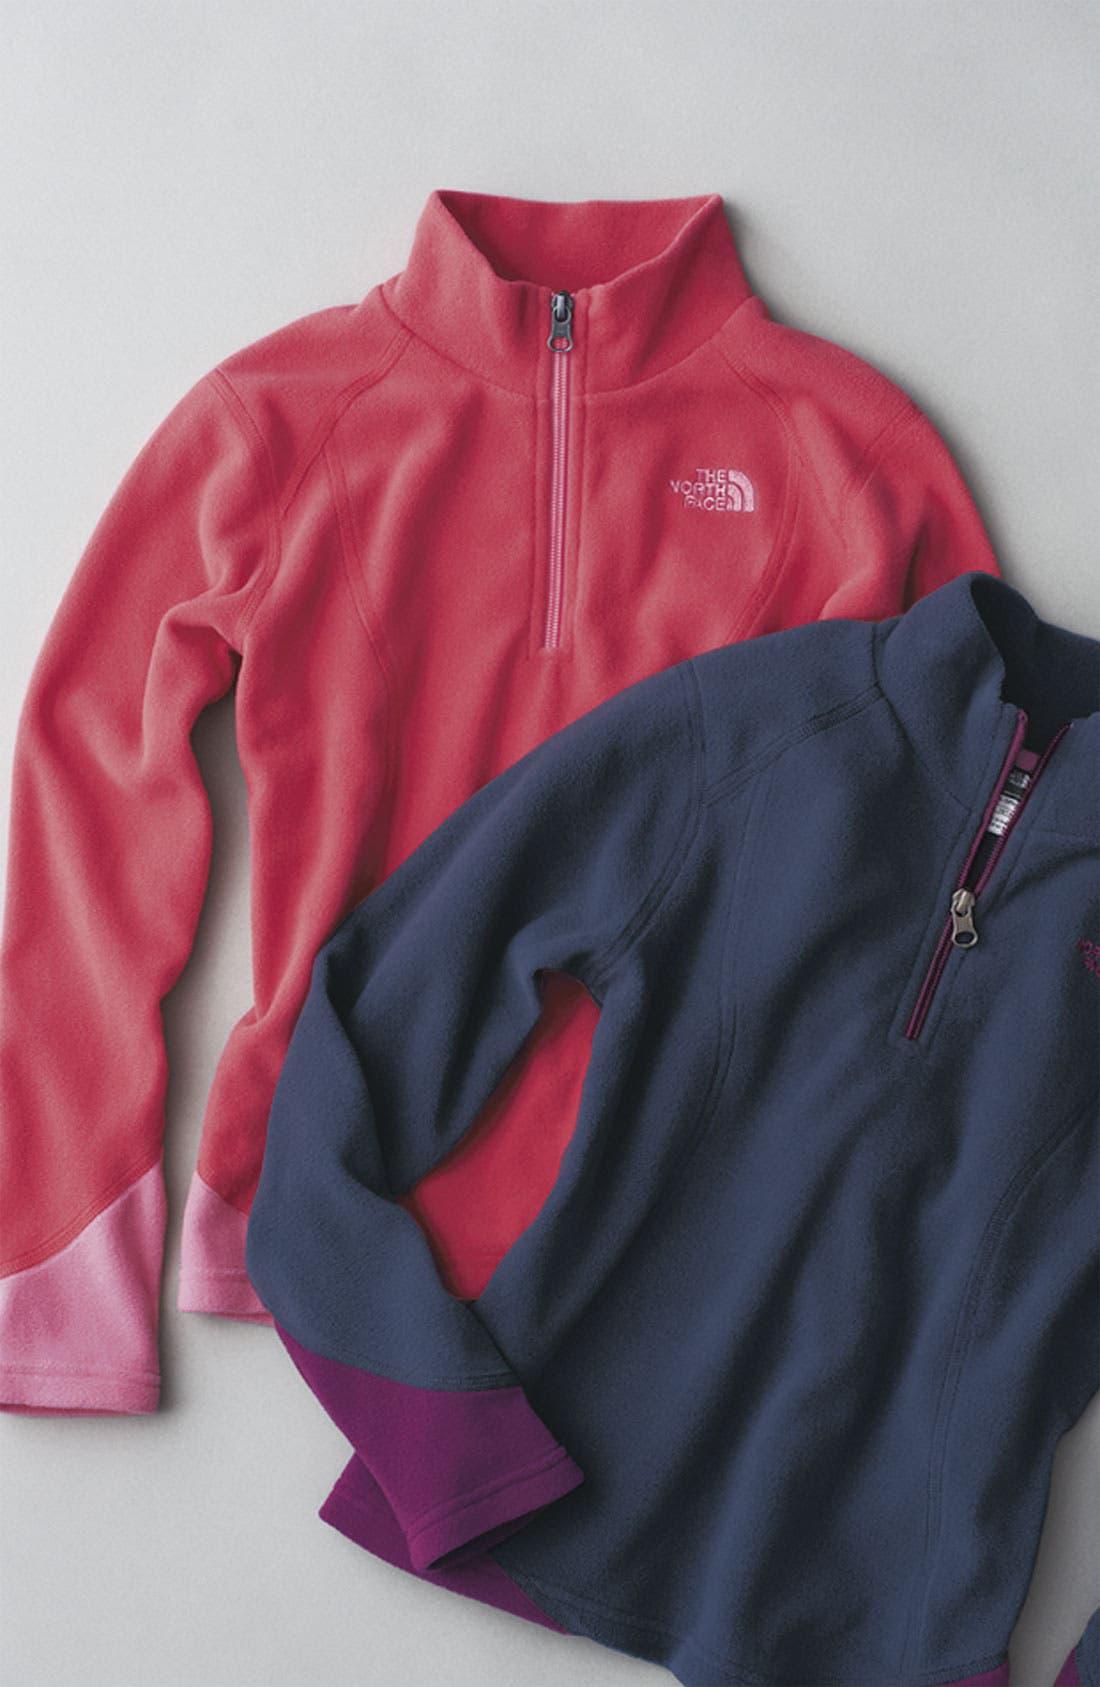 Alternate Image 2  - The North Face 'Glacier' Half Zip Fleece Jacket (Big Girls)